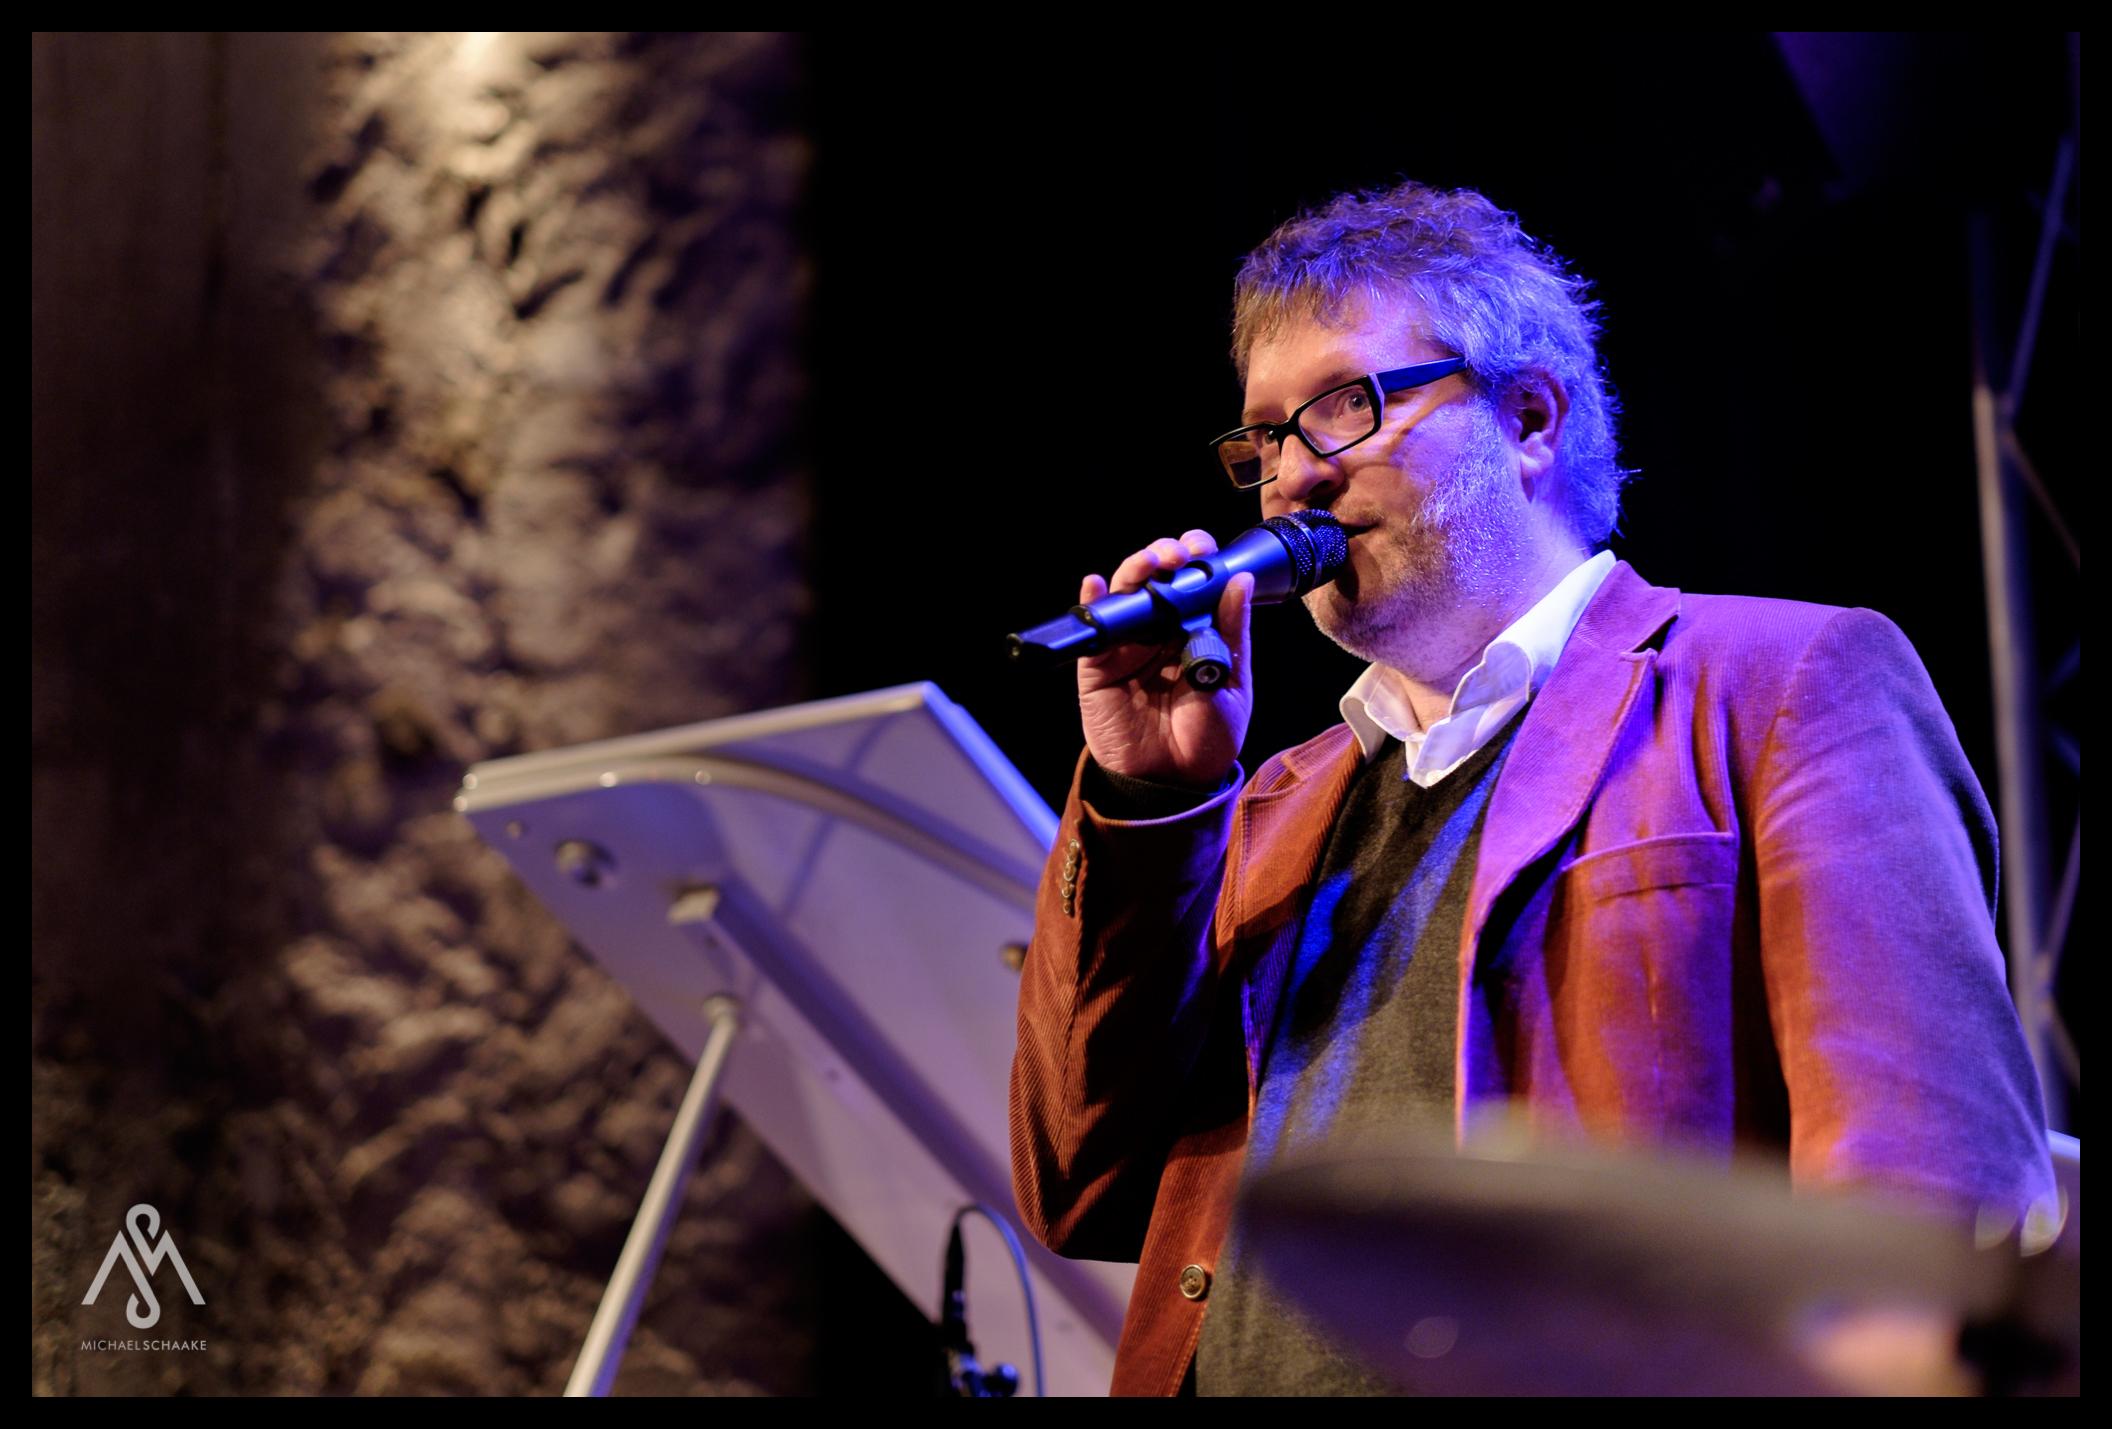 Thomas Kimmerle - Mr. JazzInConcert